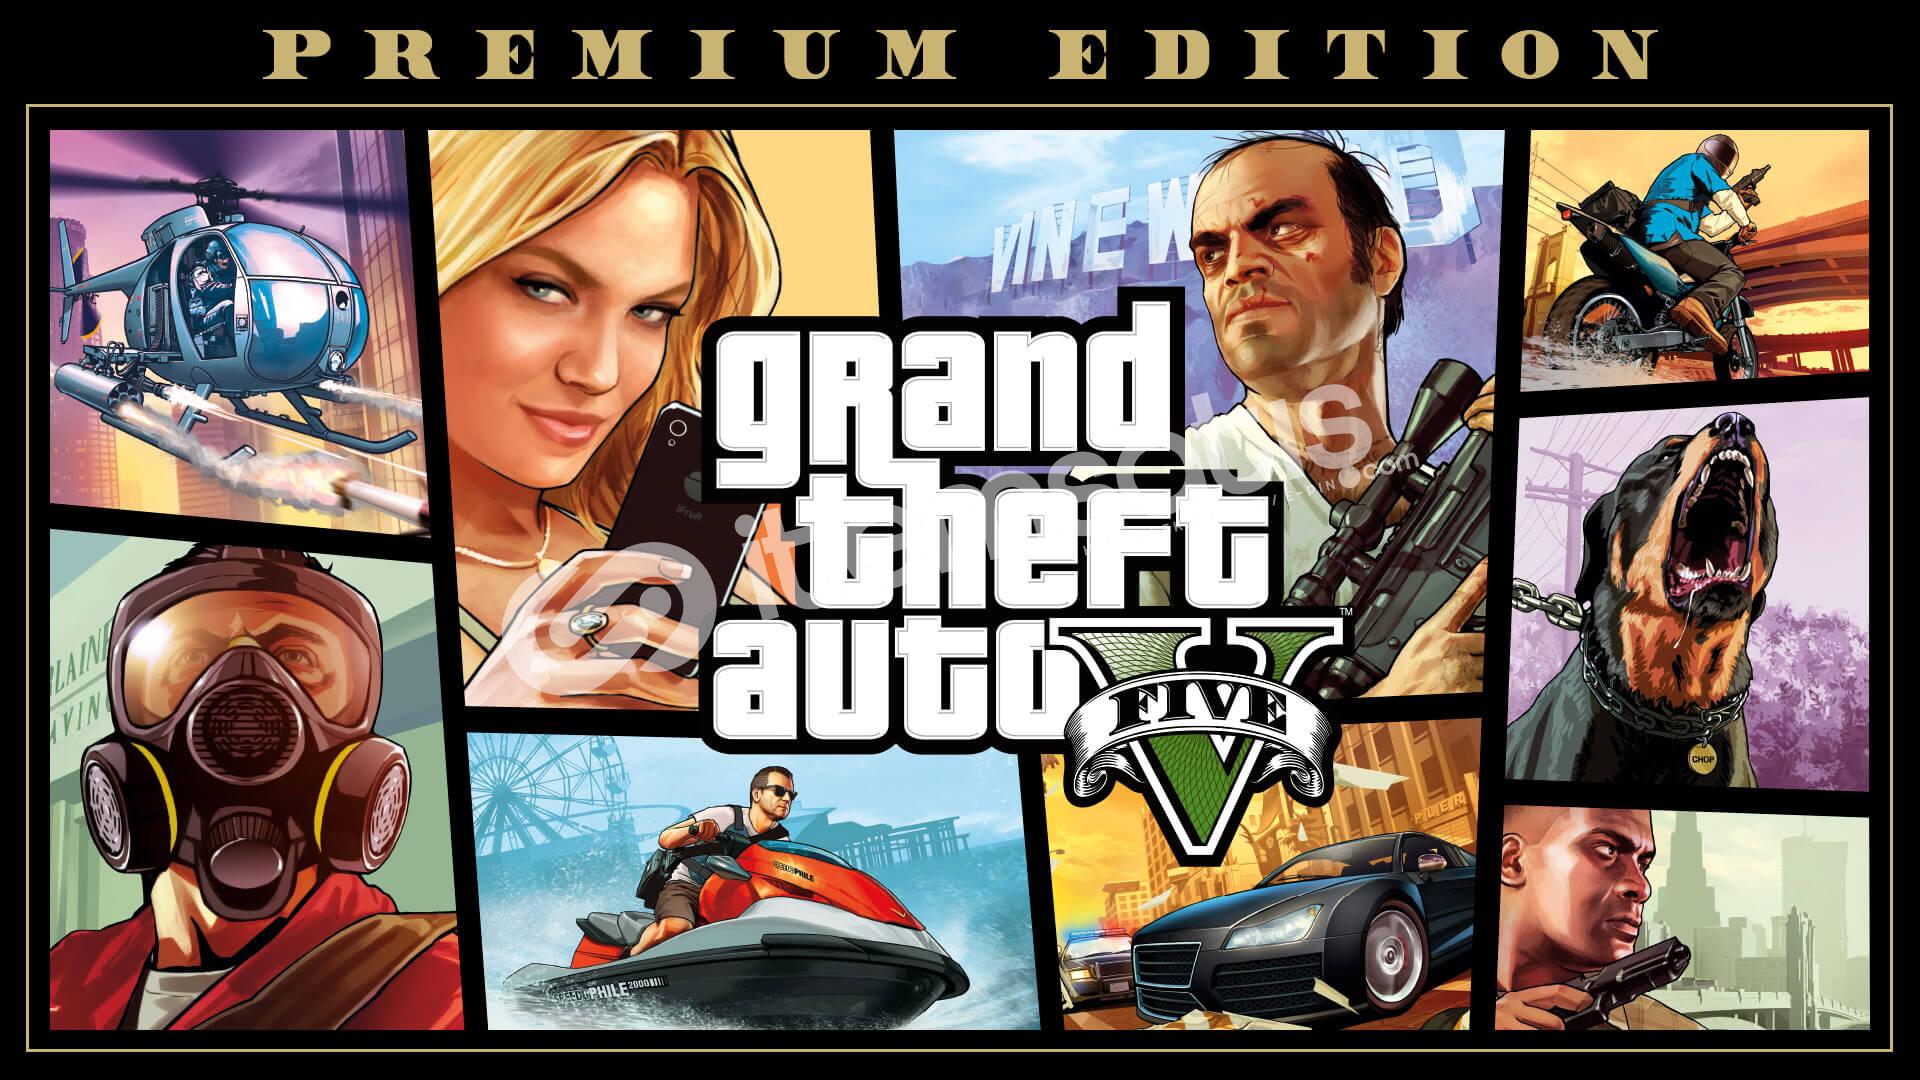 GTA V Premium Edition - E-Postalı